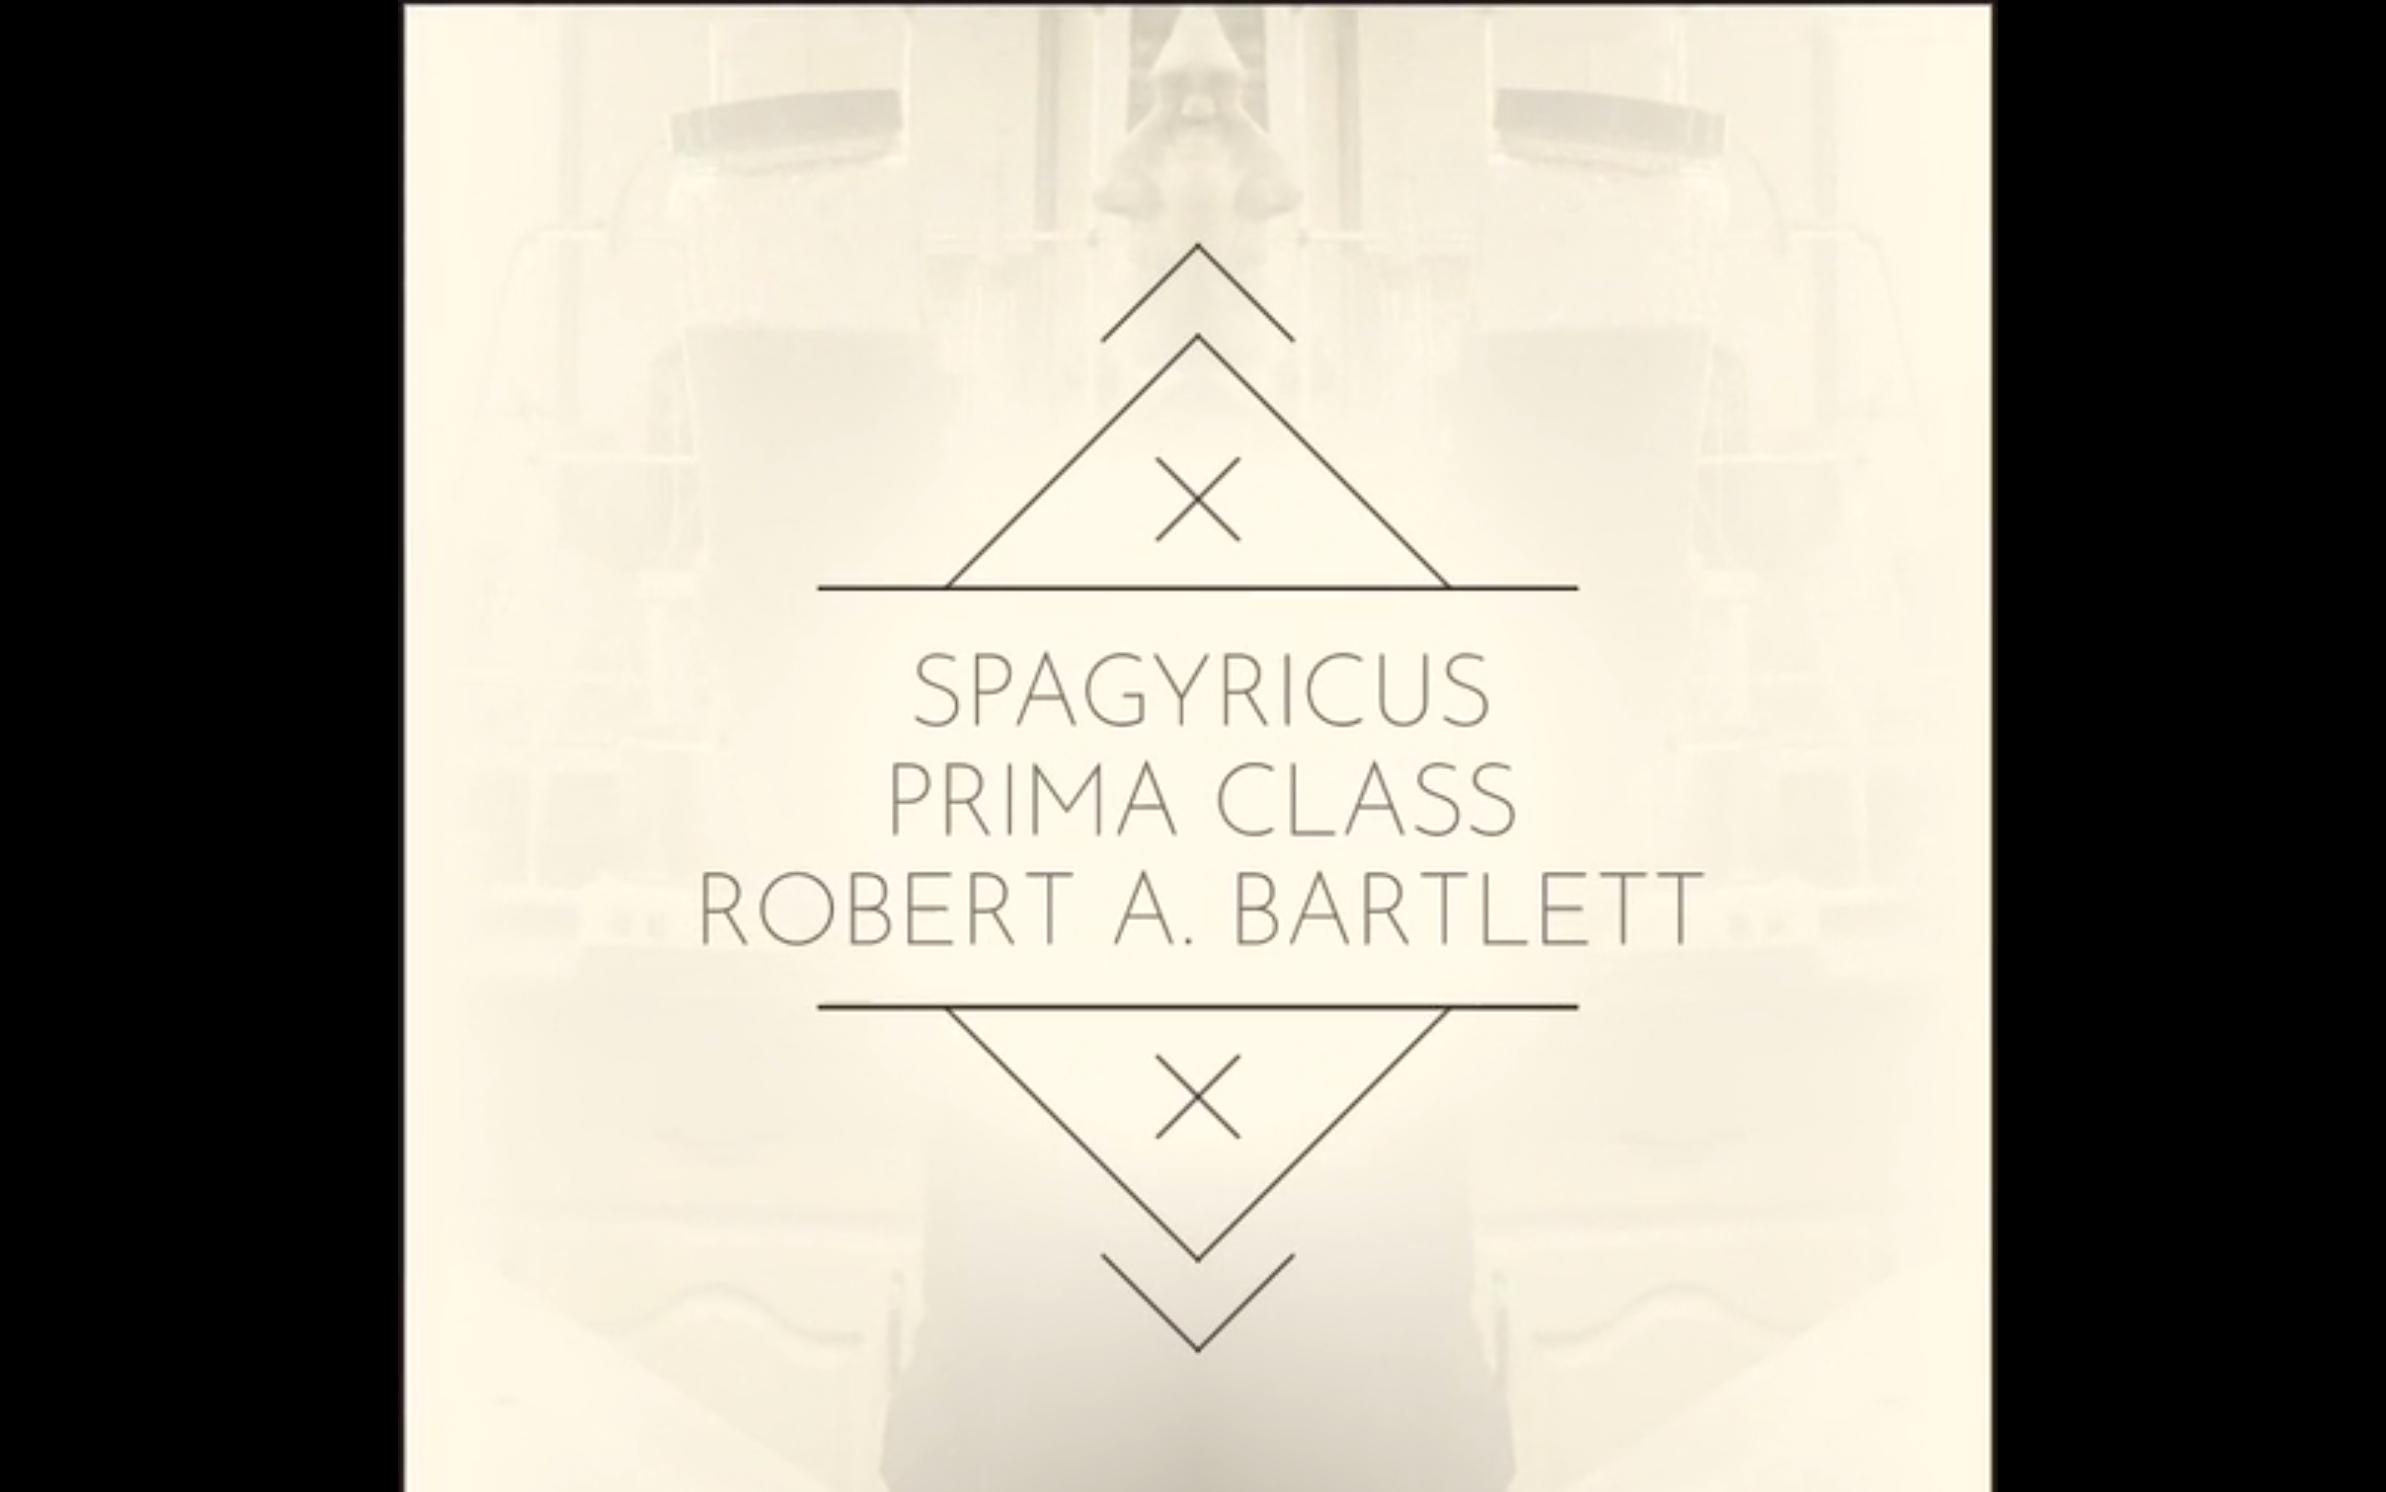 Spagyricus